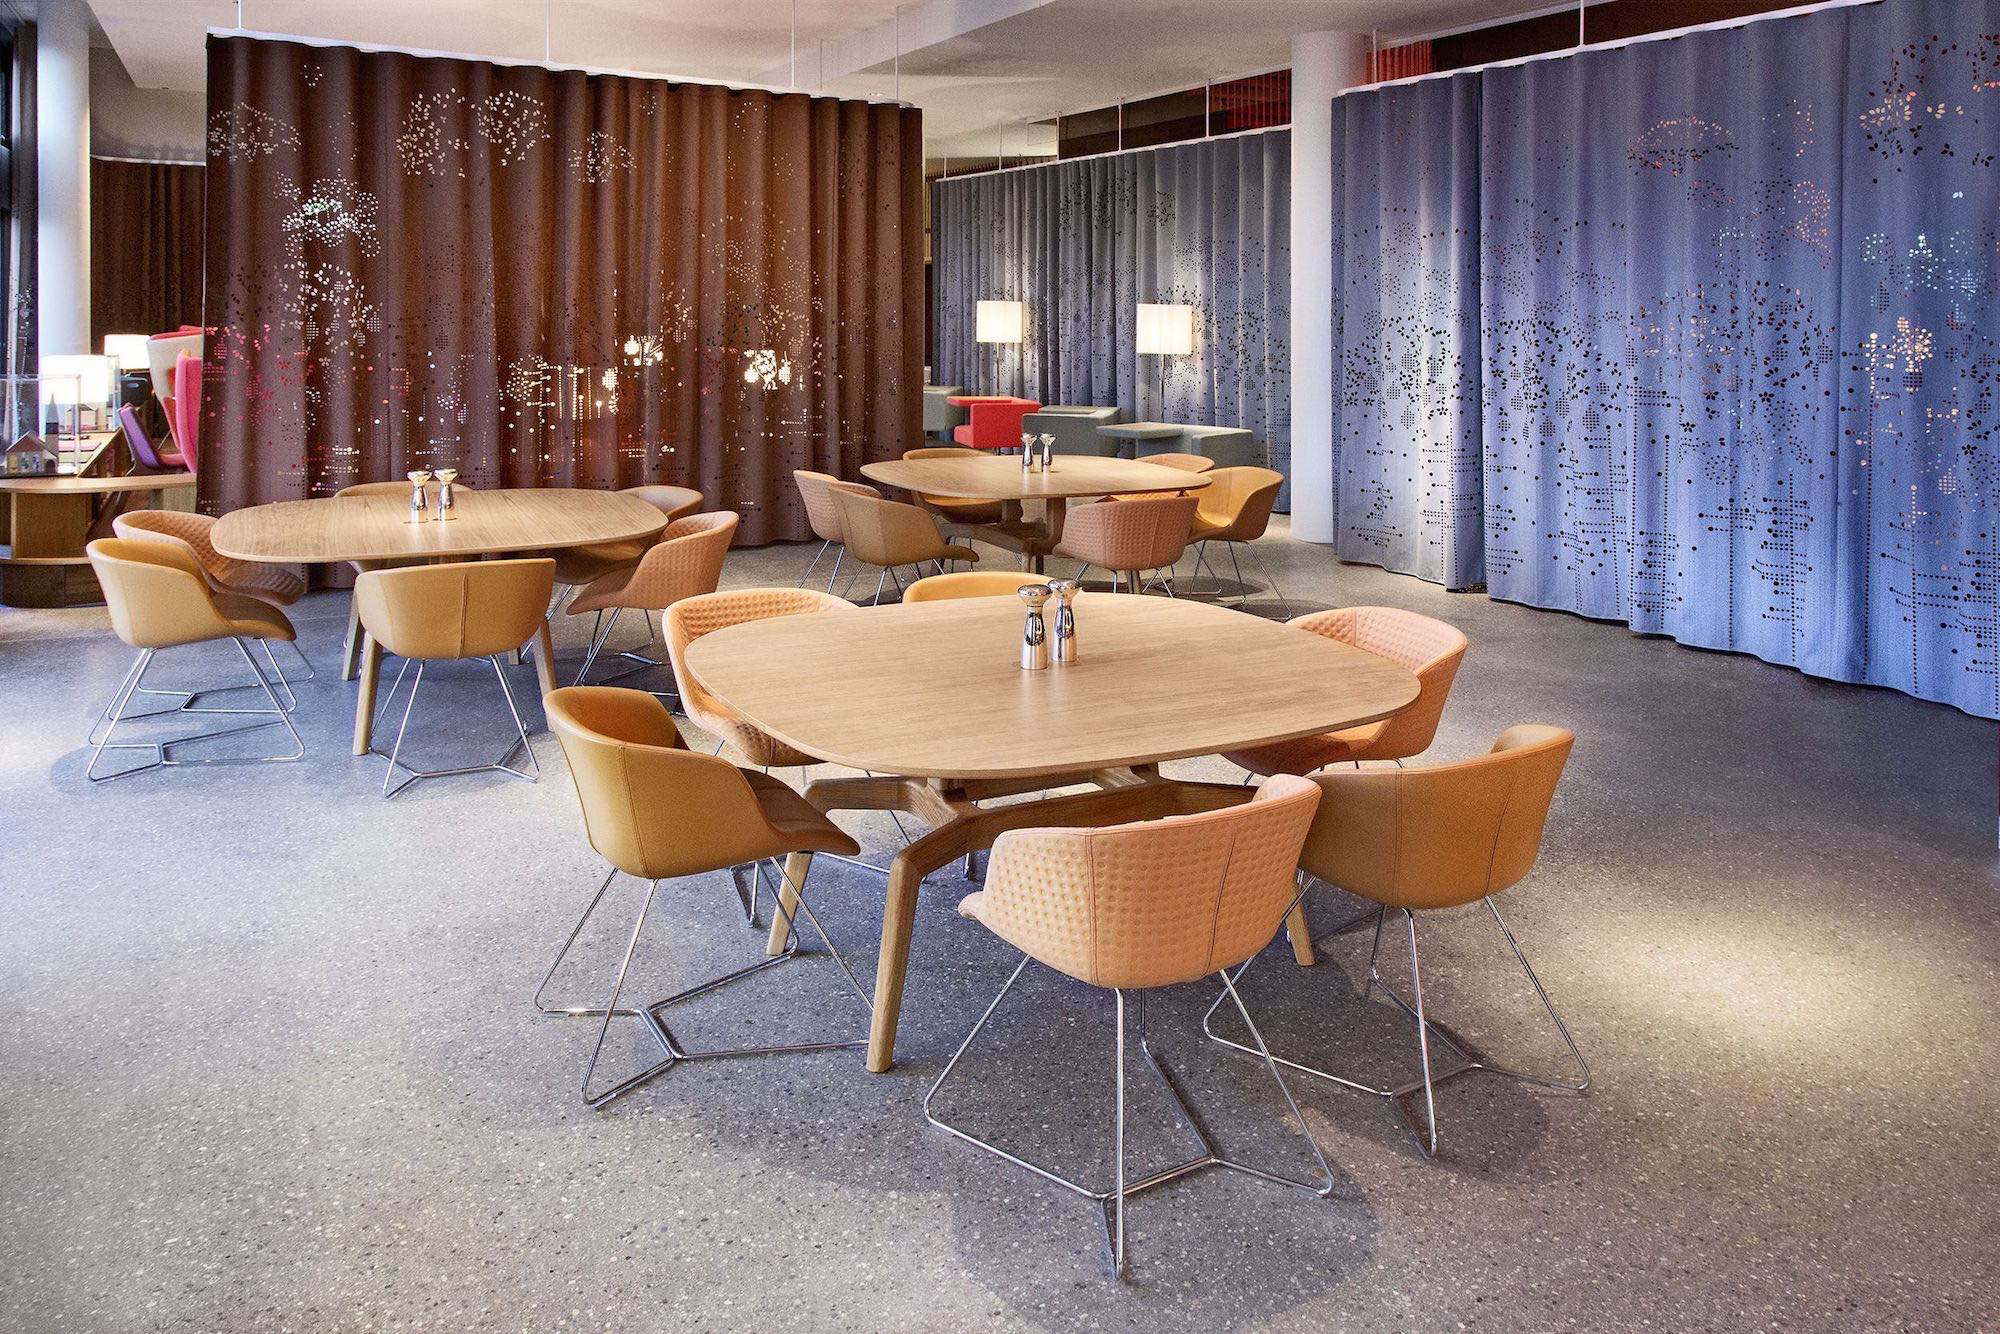 Hotel_25hours_Restaurant_03